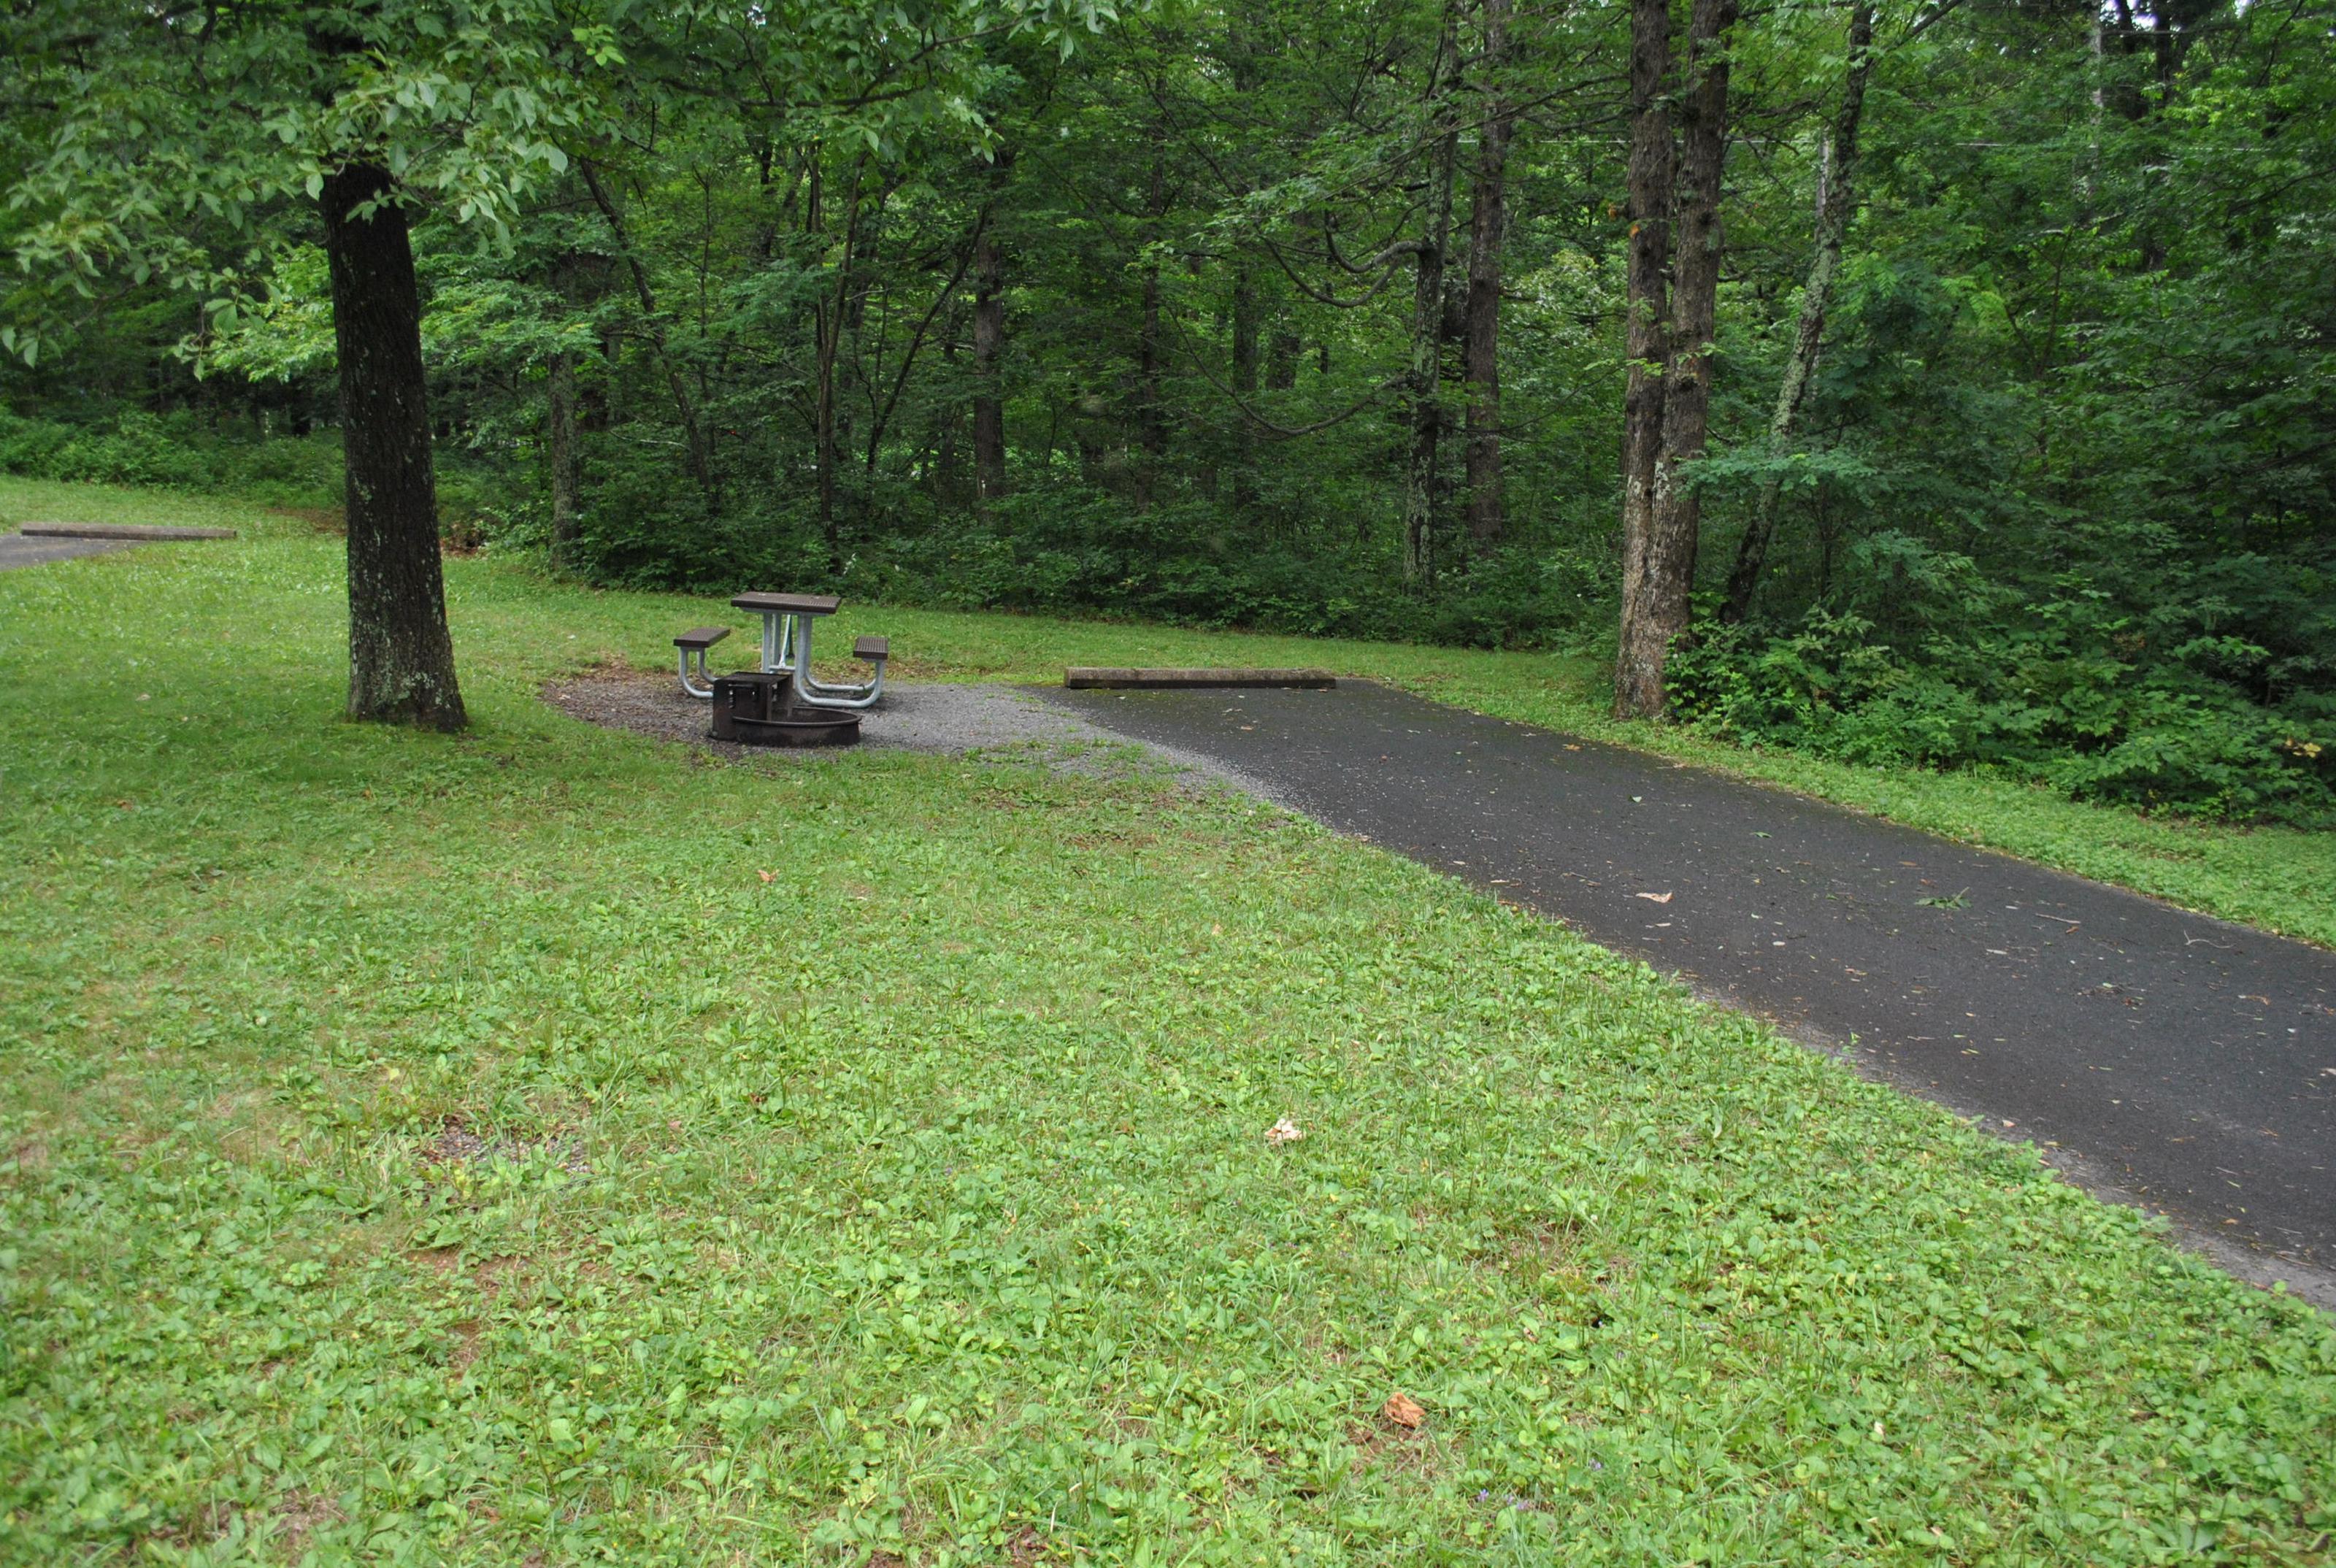 Mathews Arm Campground – Site A107